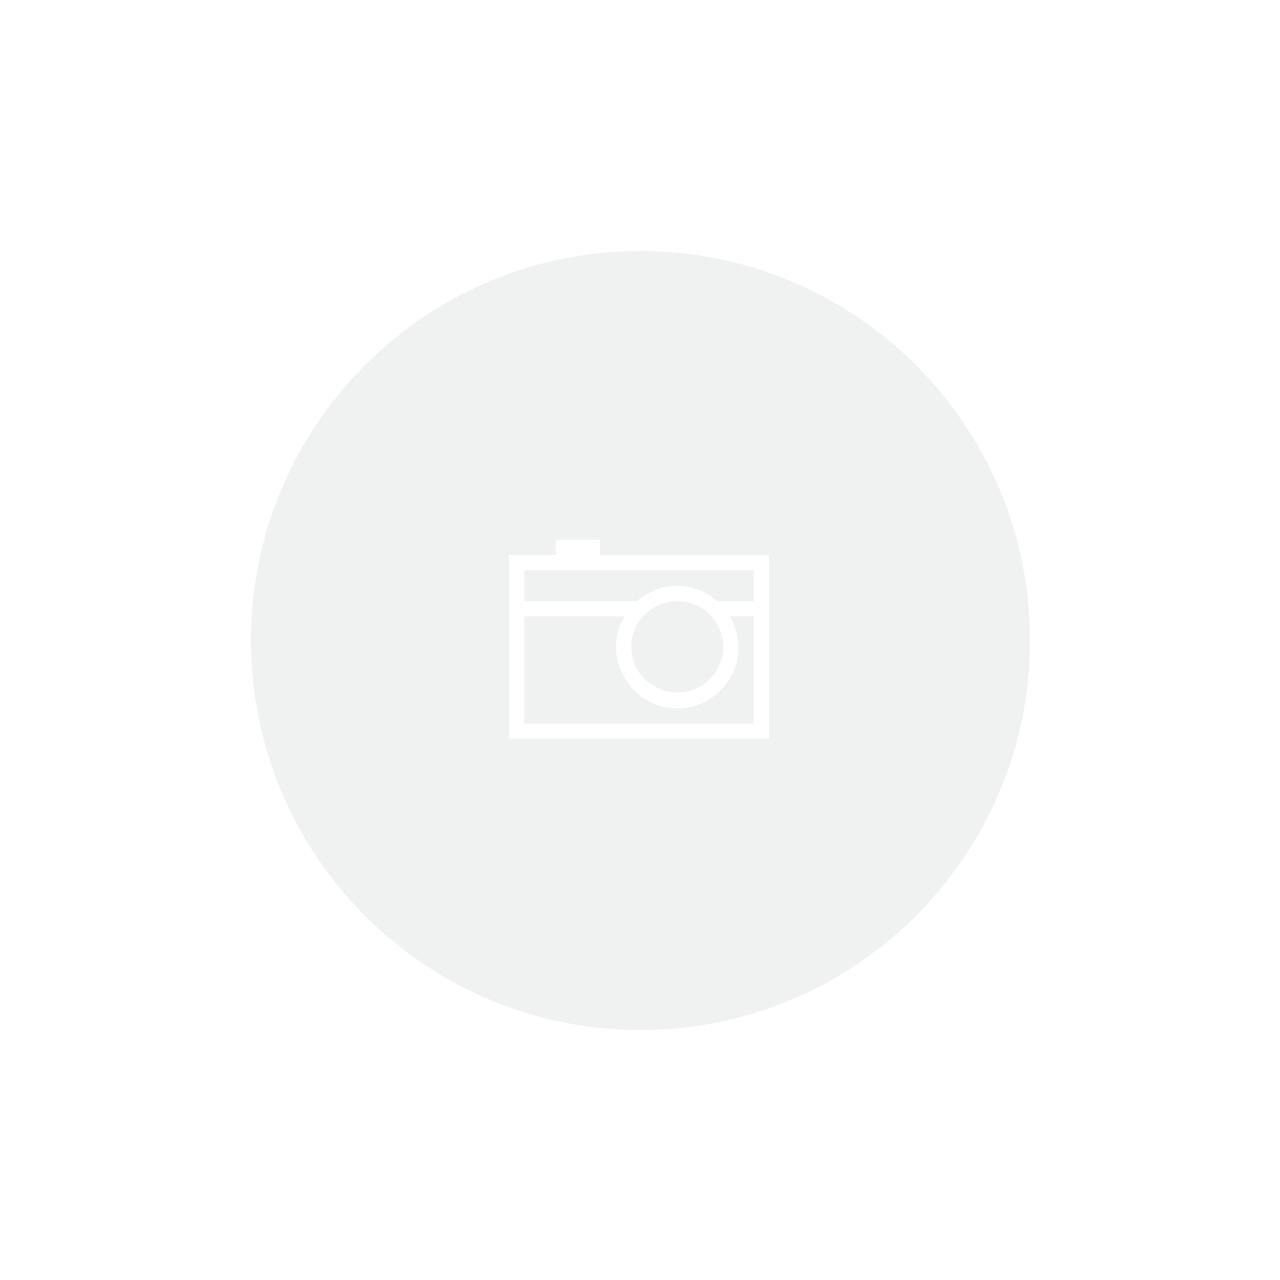 Mini Porta Joias 15,5cm Vidro Transparente